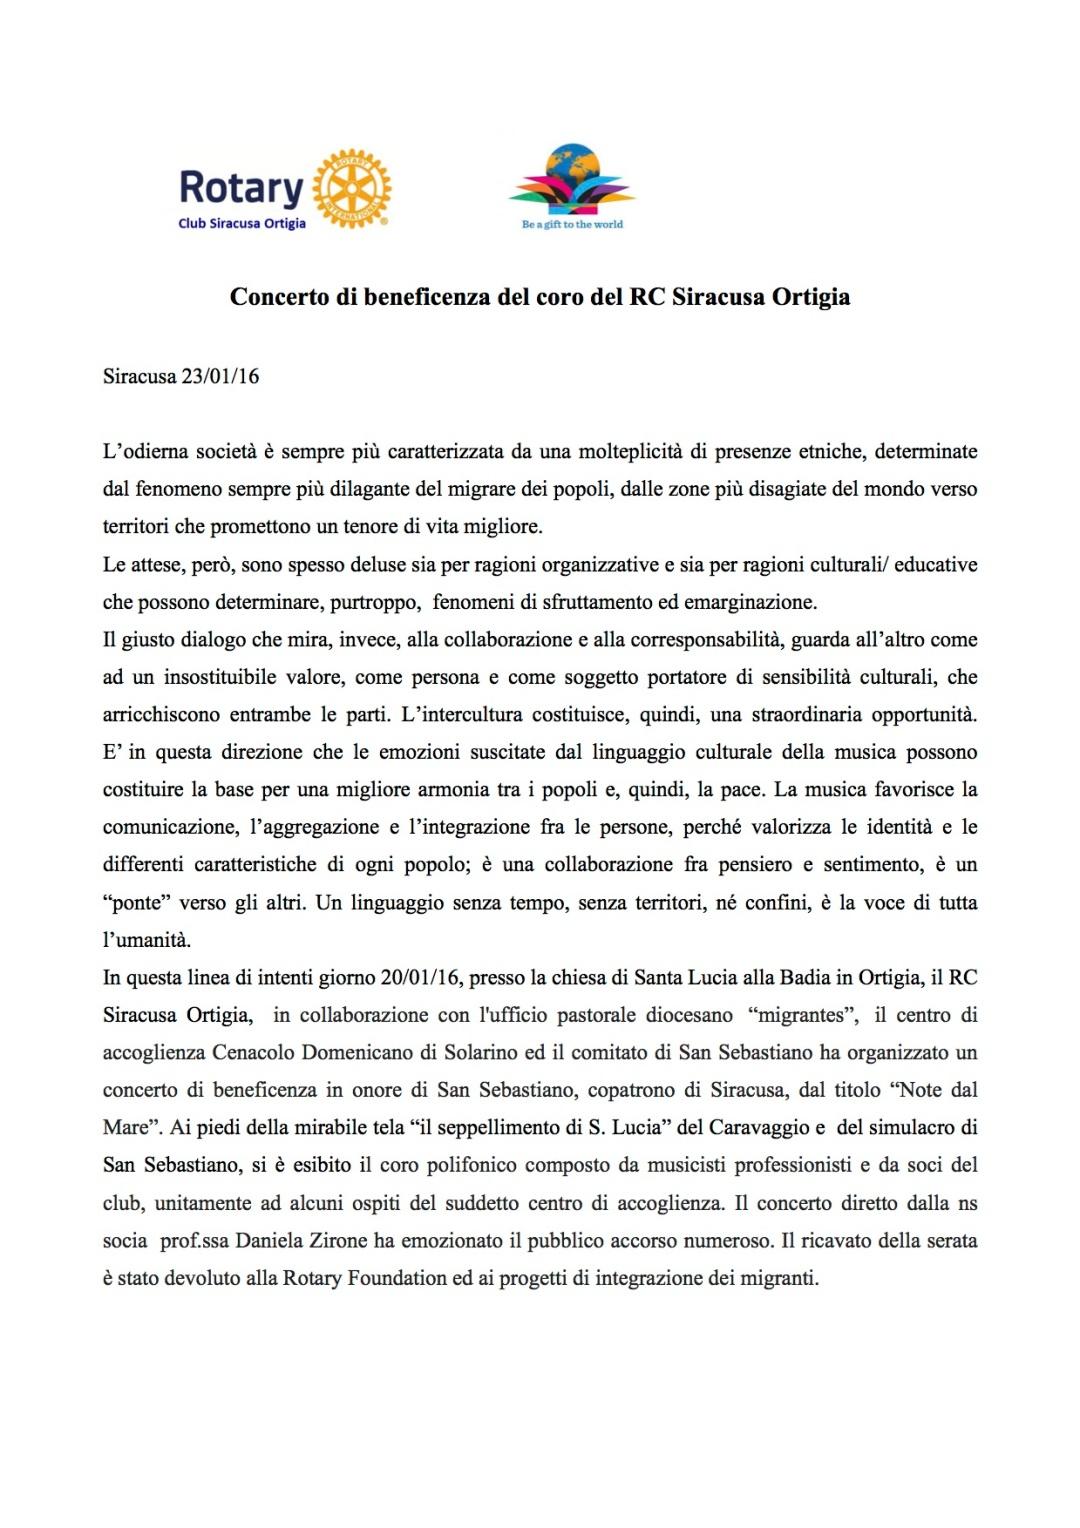 rc-siracusa-ortigia-per-giornale-rotary_febbraio-2016